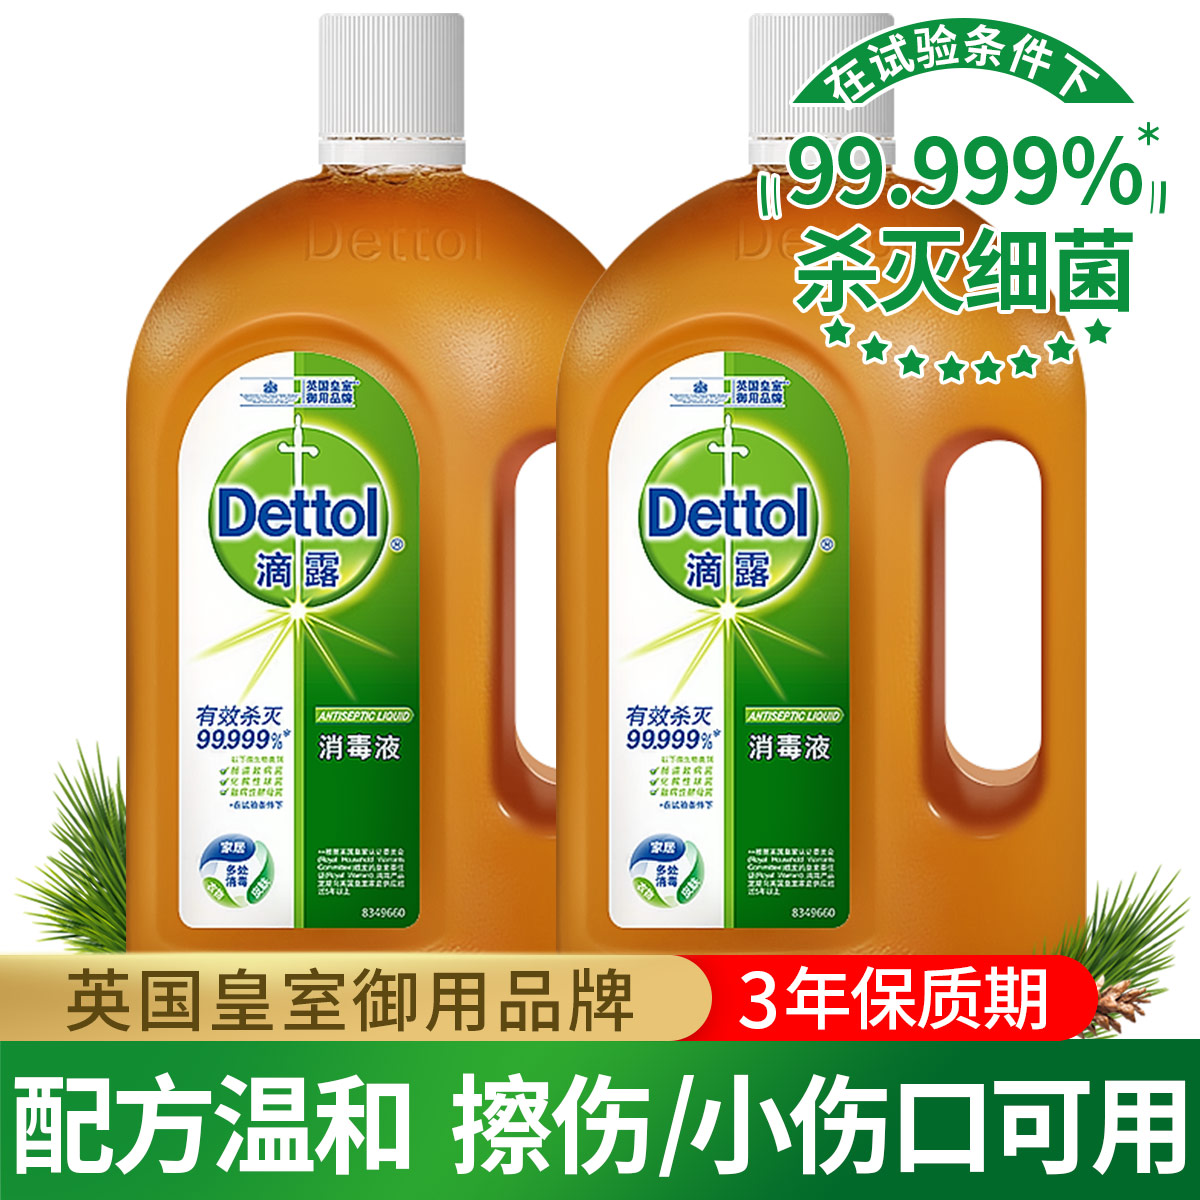 Dettol 【杀菌99.999%】高效杀菌除螨 滴露家用消毒液1.2L*2 伤口也适用